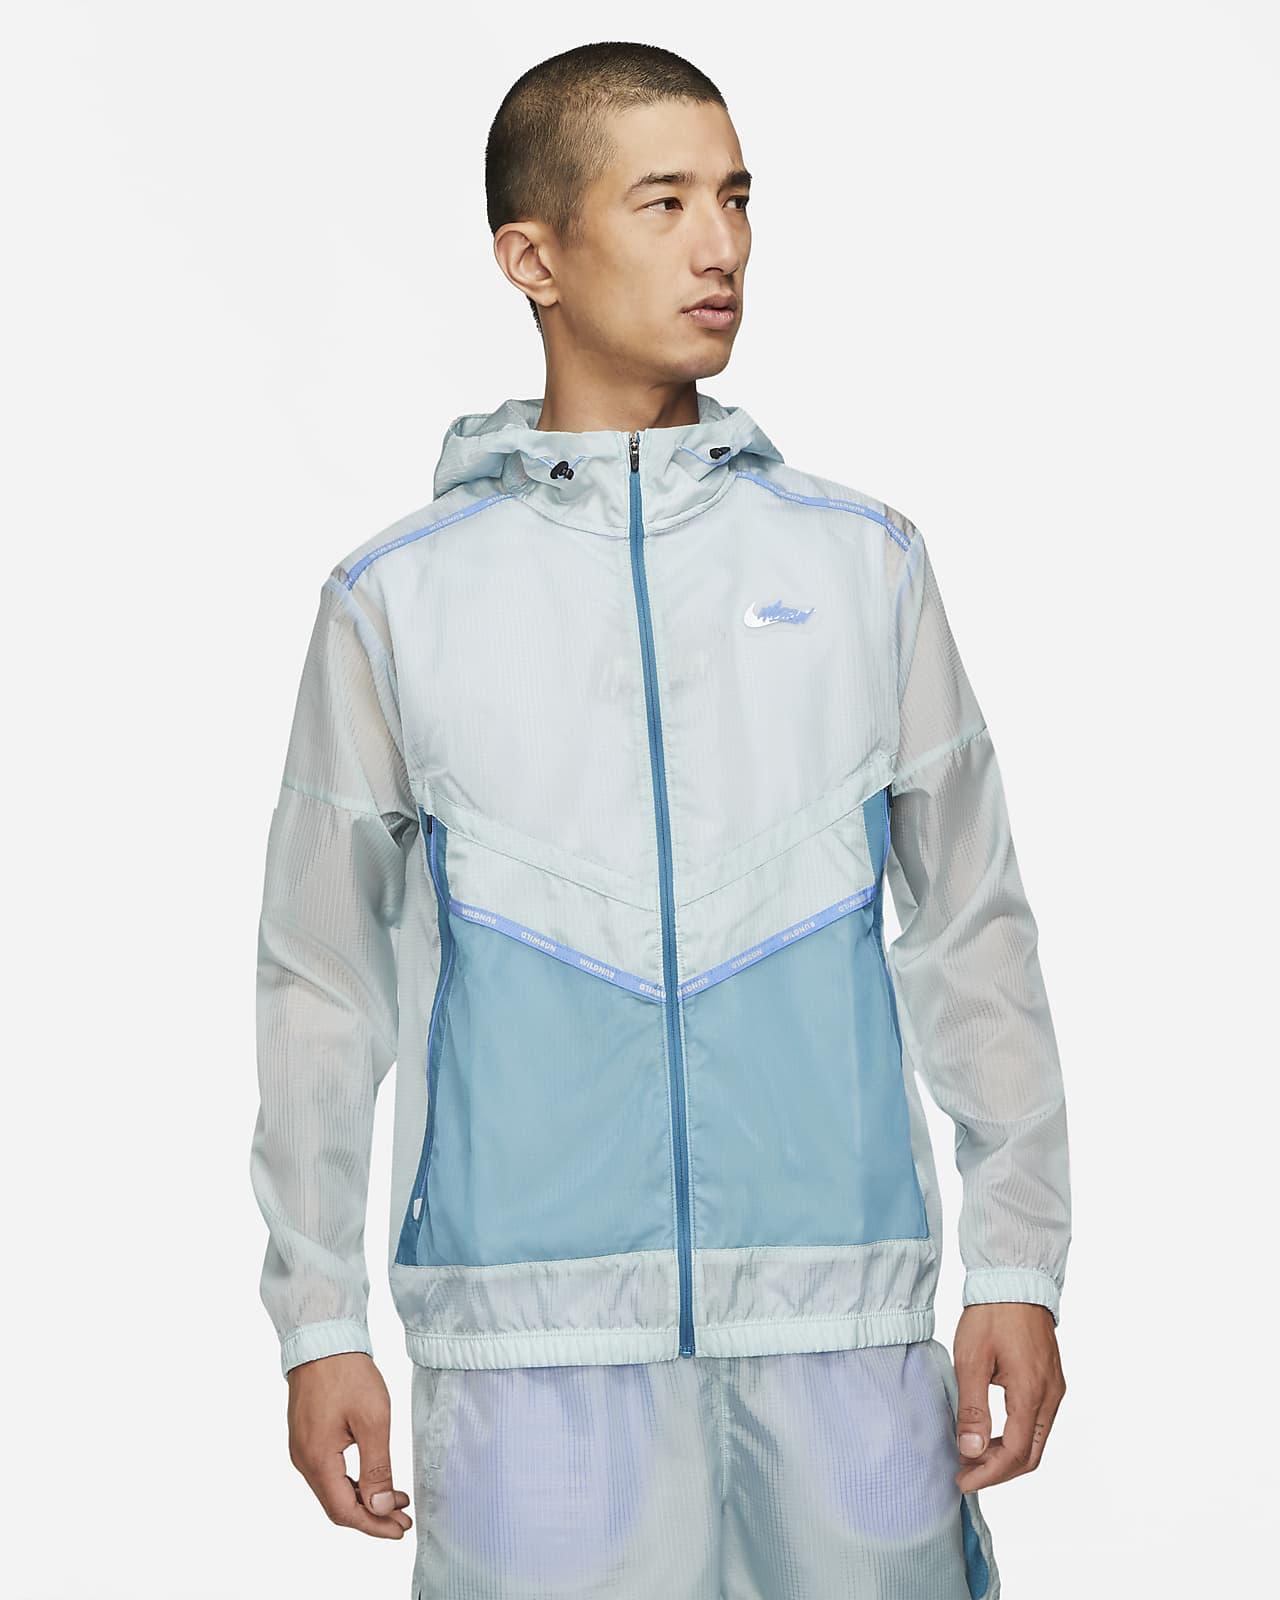 Nike Repel Wild Run Windrunner Men's Graphic Running Jacket